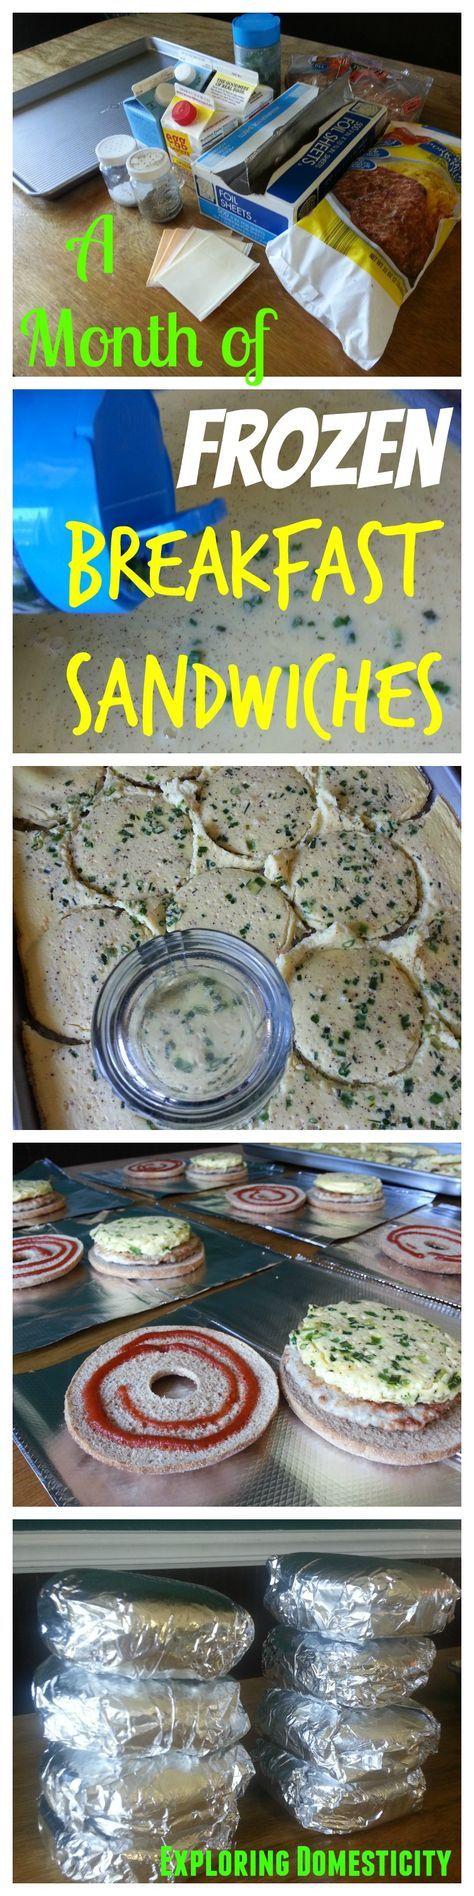 Frozen Breakfast Sandwiches for a month